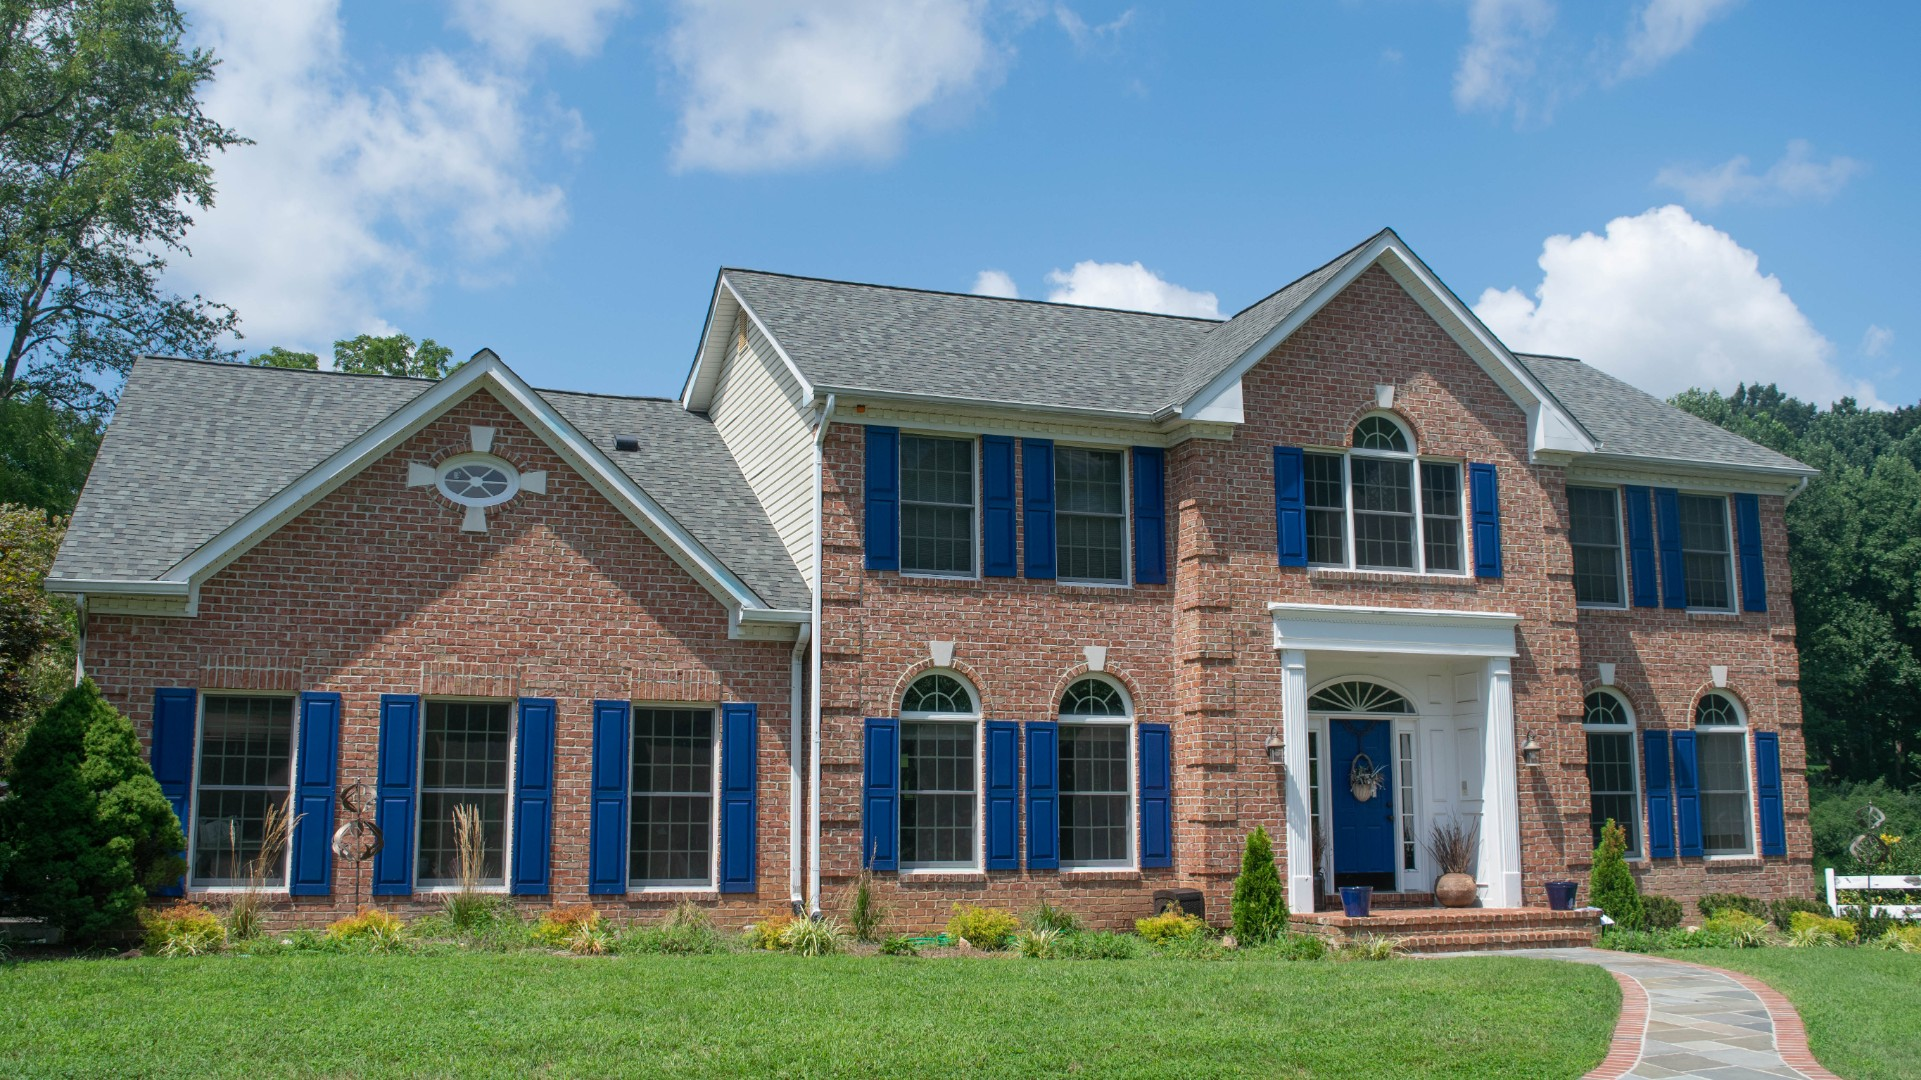 SmartRoof - Residential, Commercial Lumbertown NJ Roofing Contractors